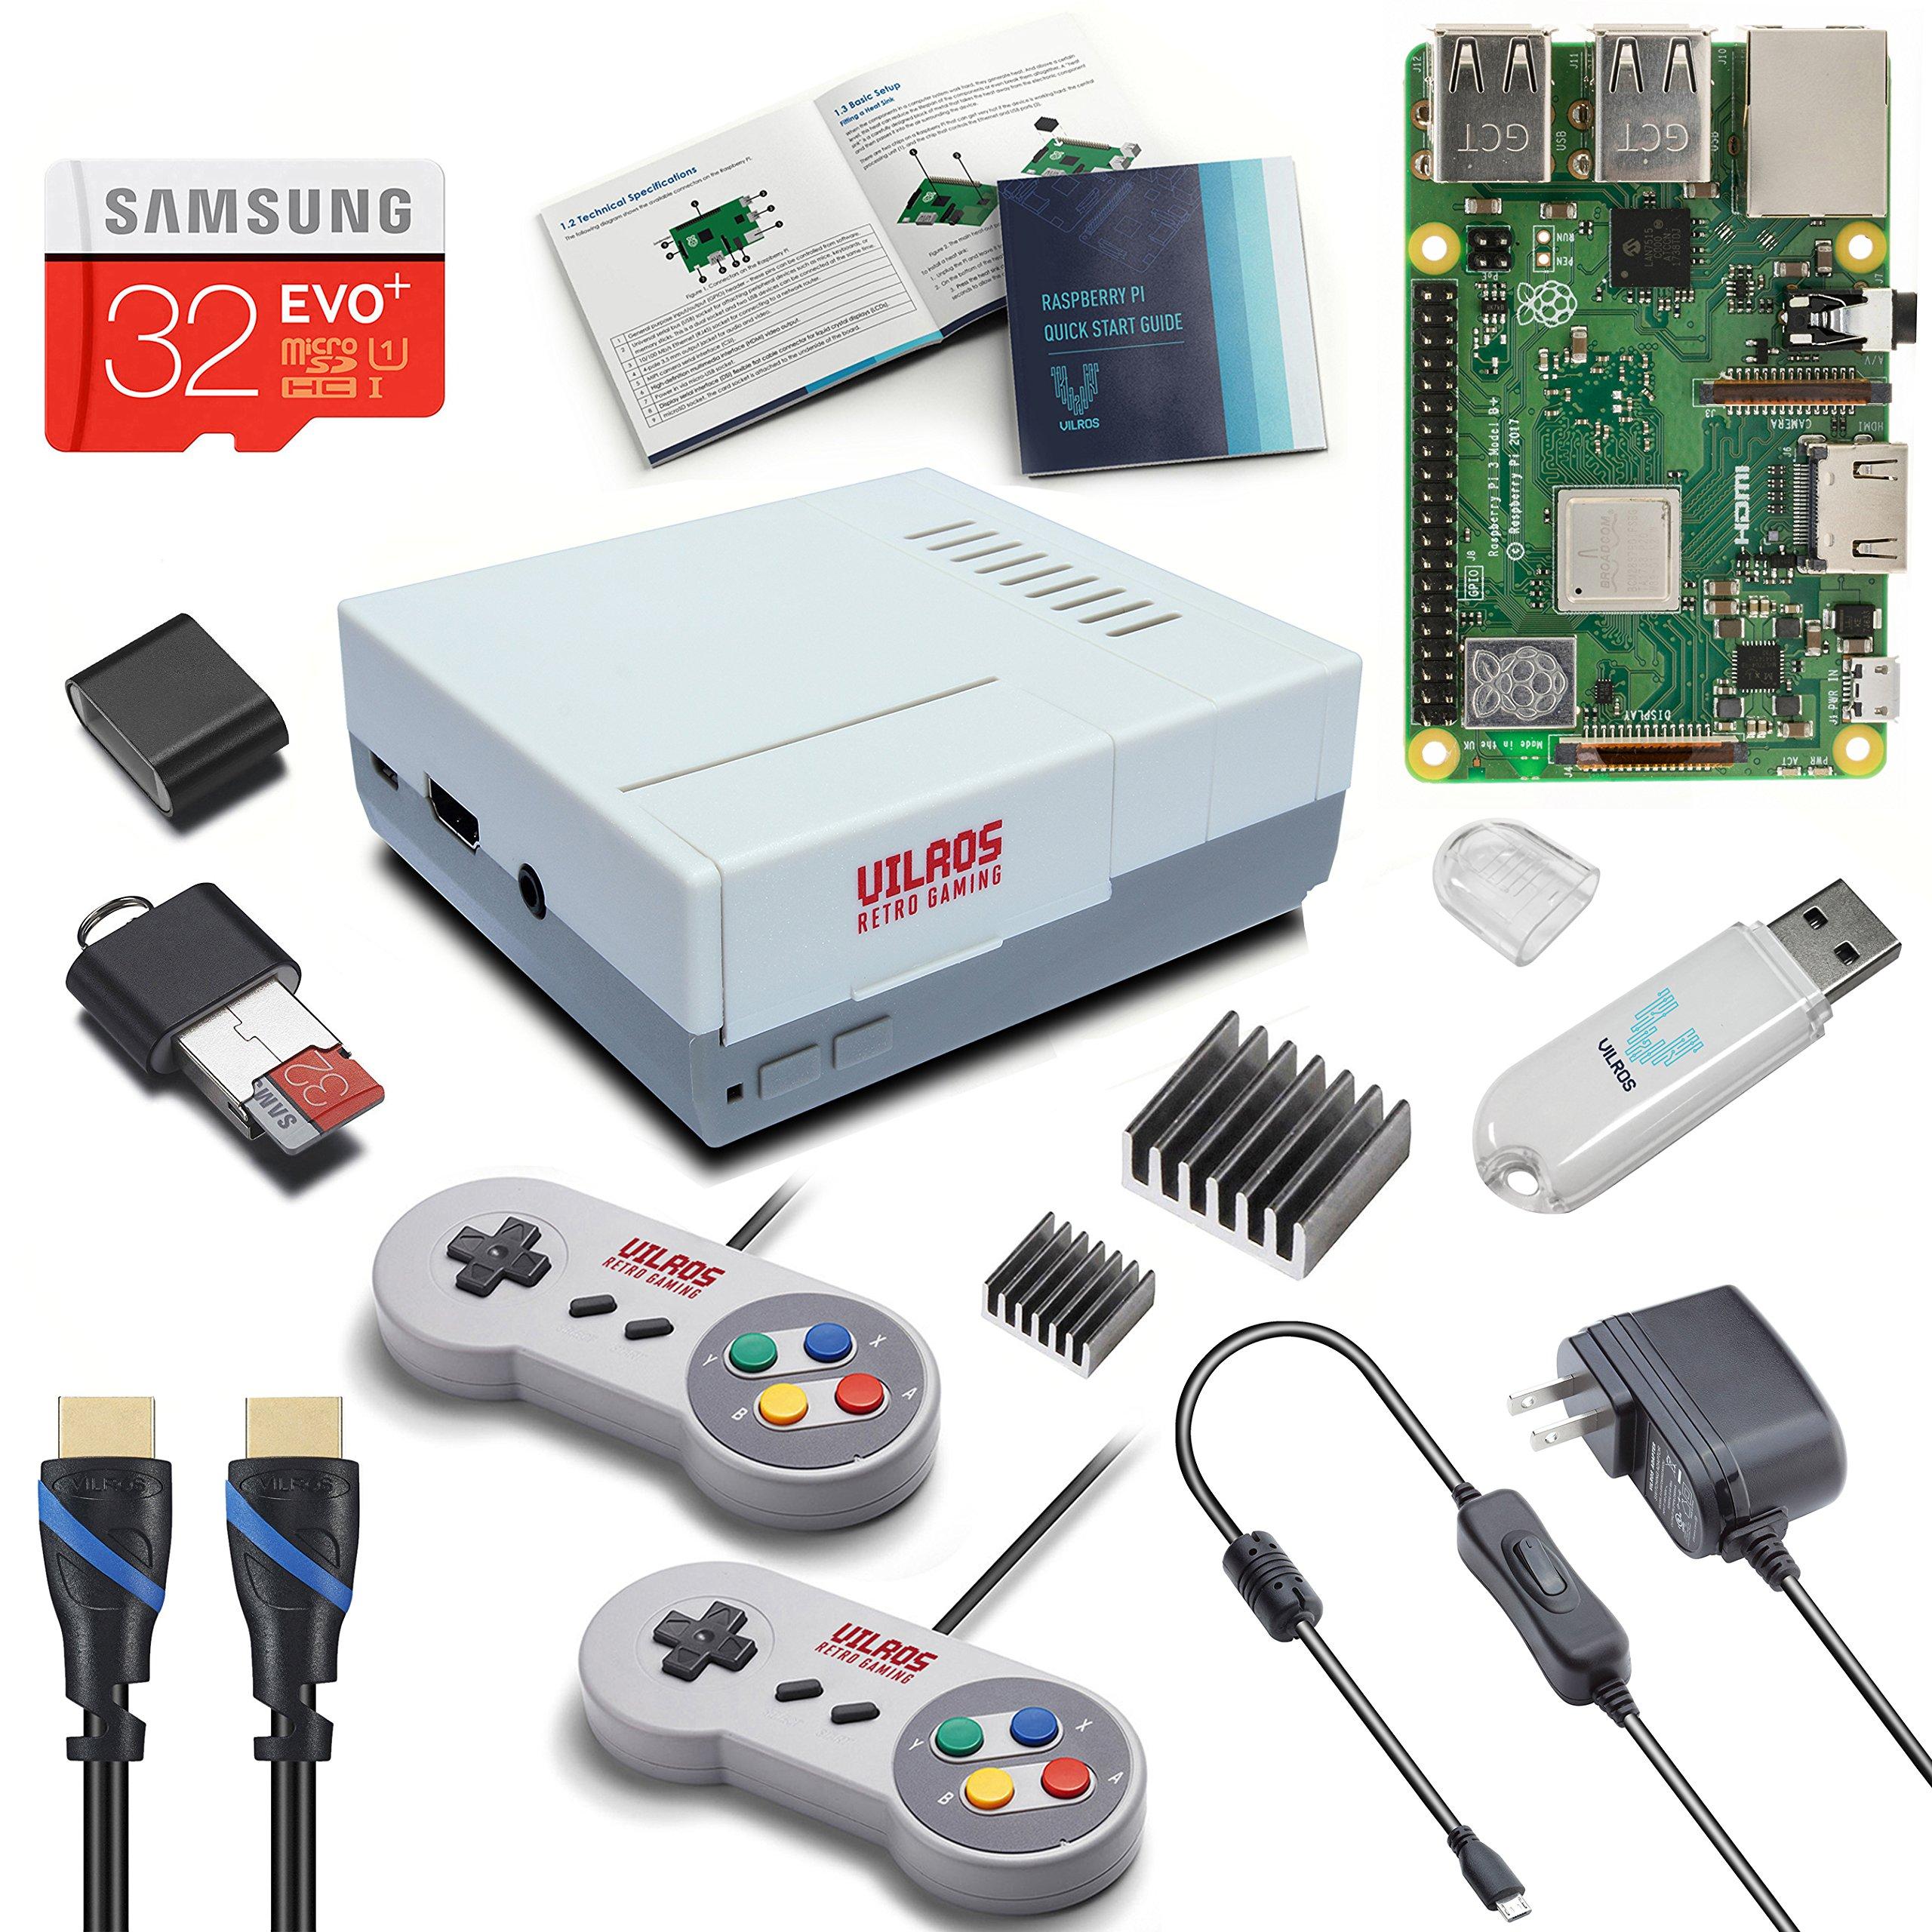 V-Kits Raspberry Pi 3 Model B+ (B Plus) Retro Arcade Gaming Kit with 2 Classic USB Gamepads [2018 Model] by Vilros